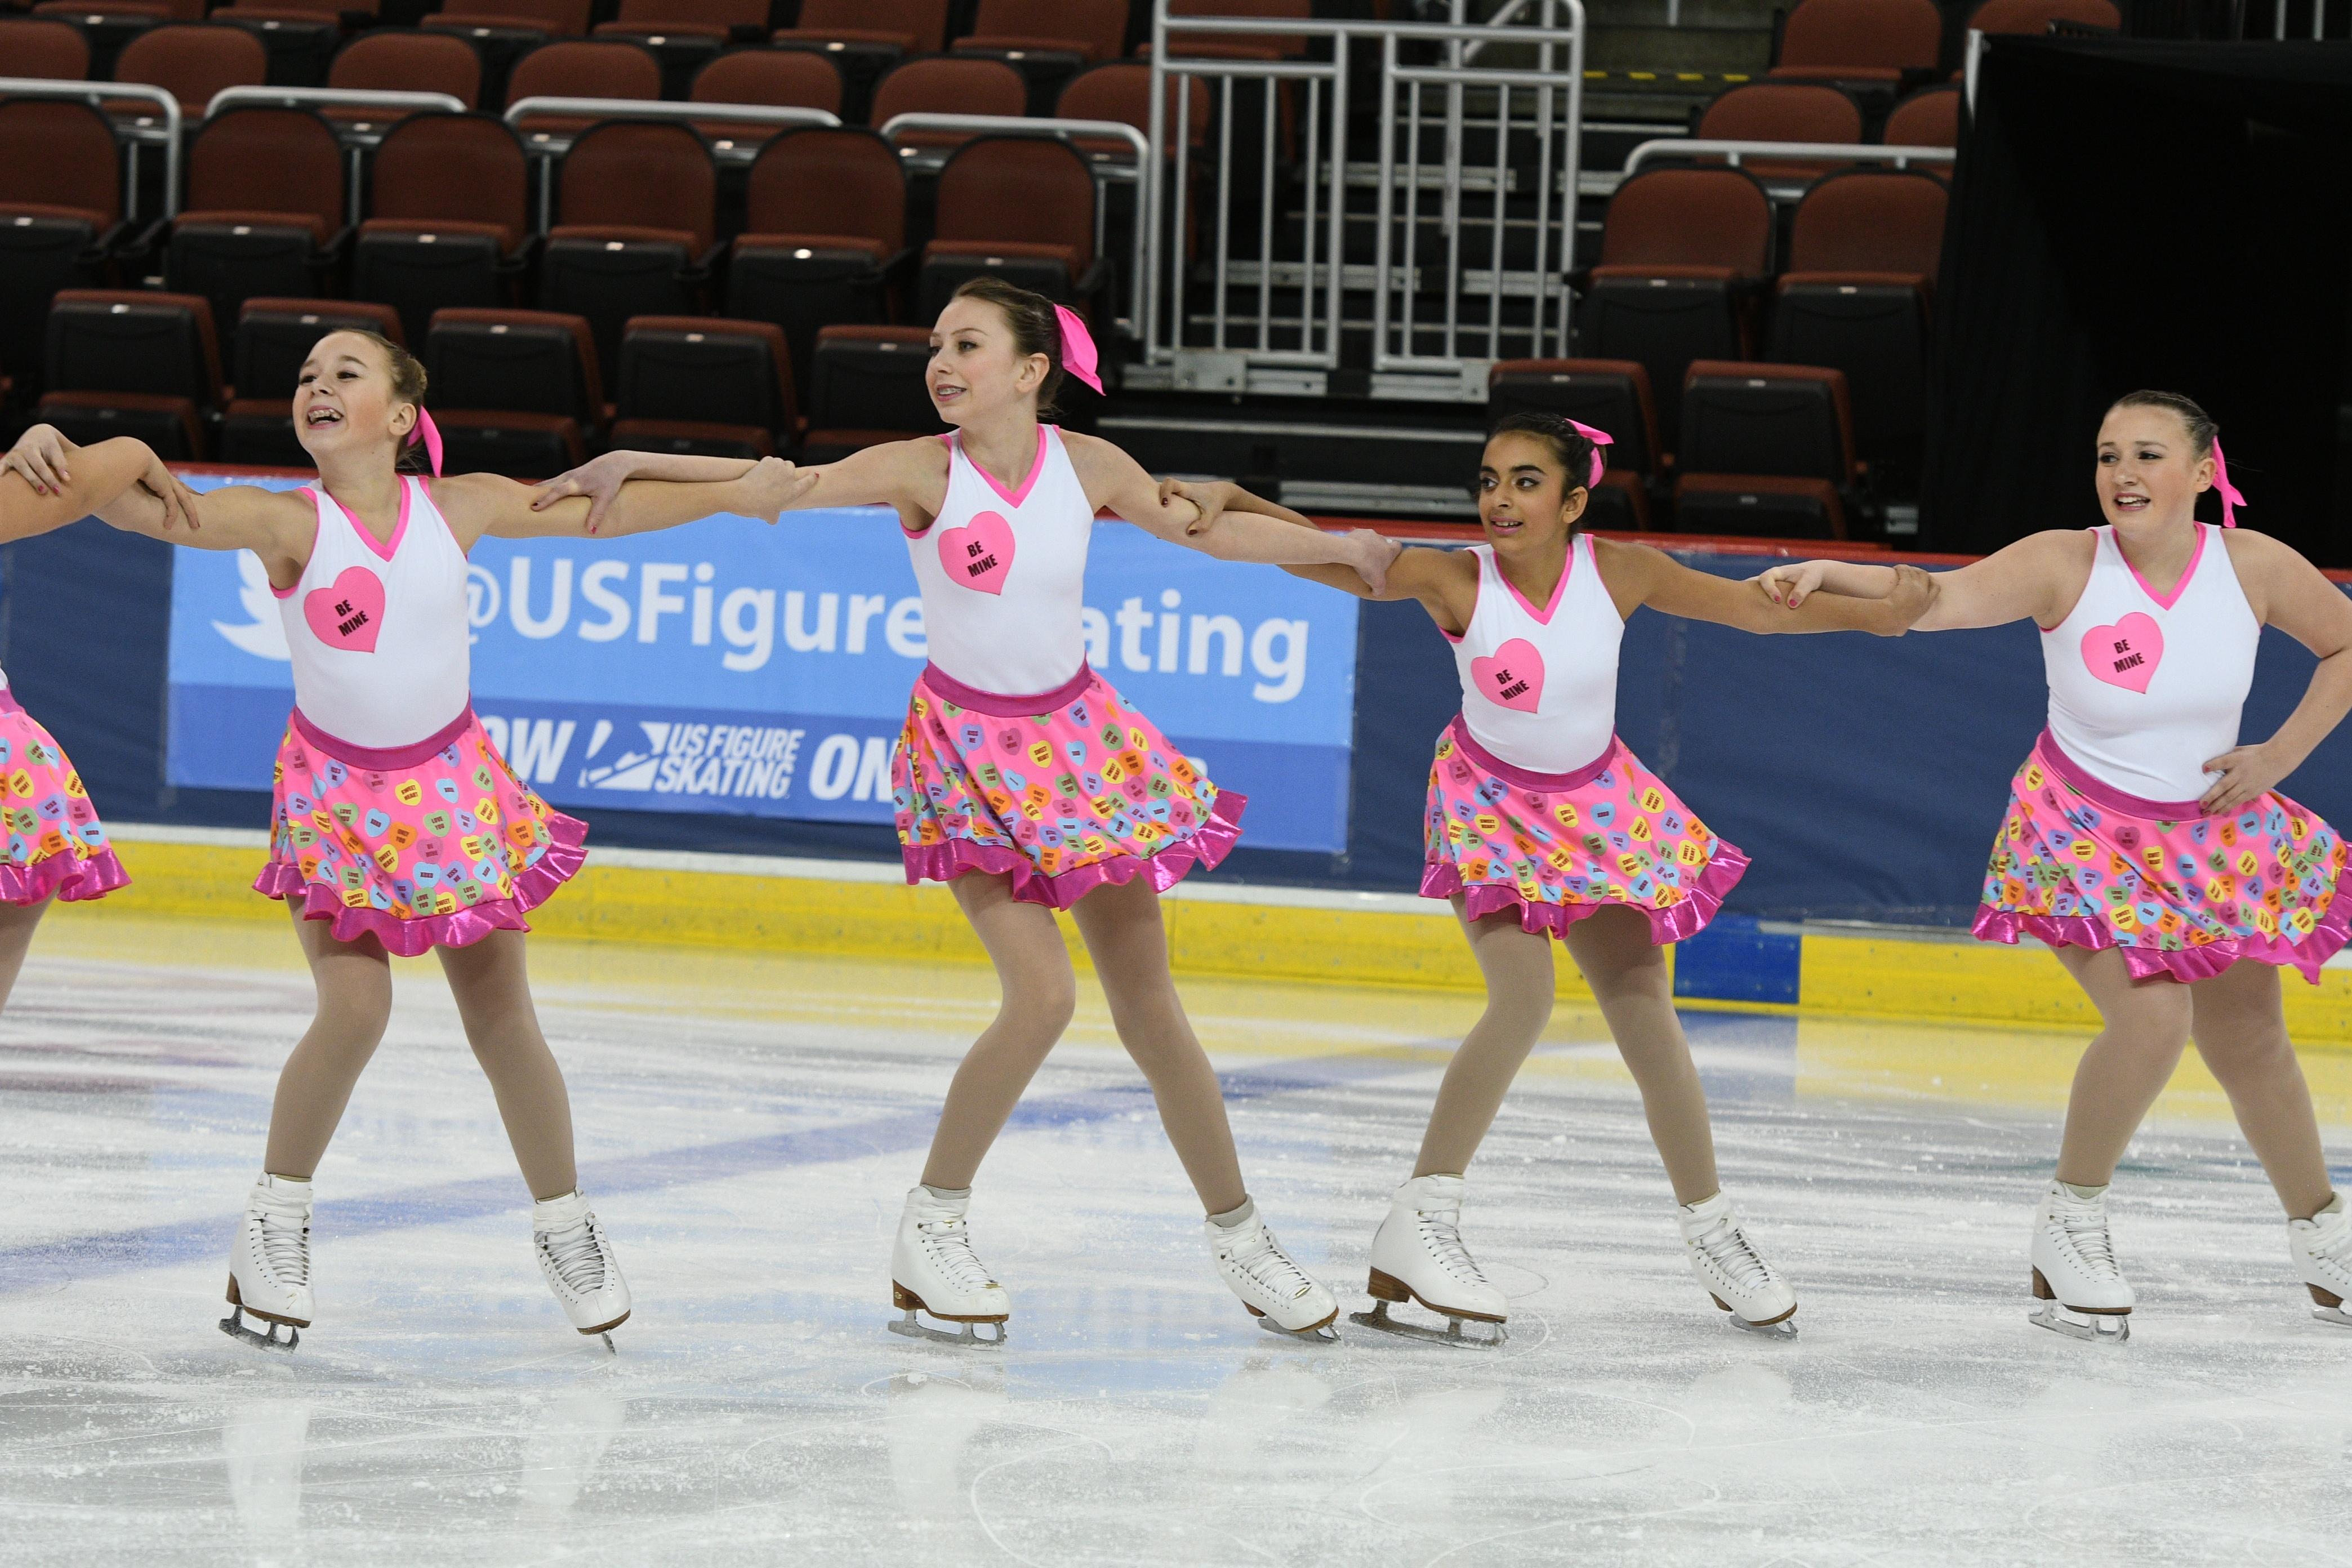 onyx synchronized skating team custom conversation heart themed skate dresses